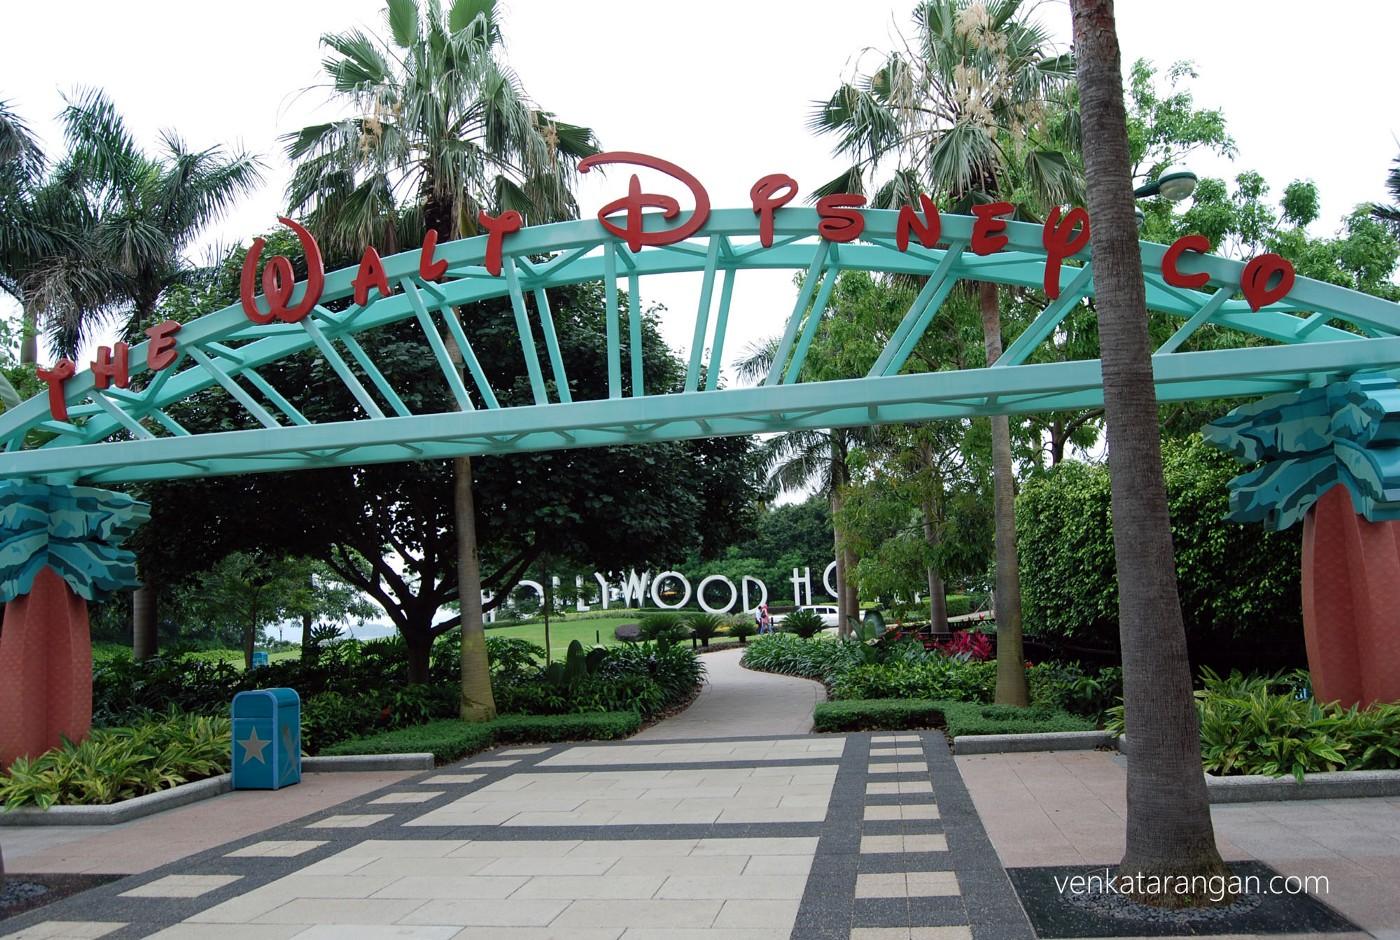 Disney Hollywood Hotel has replicas of Hollywood